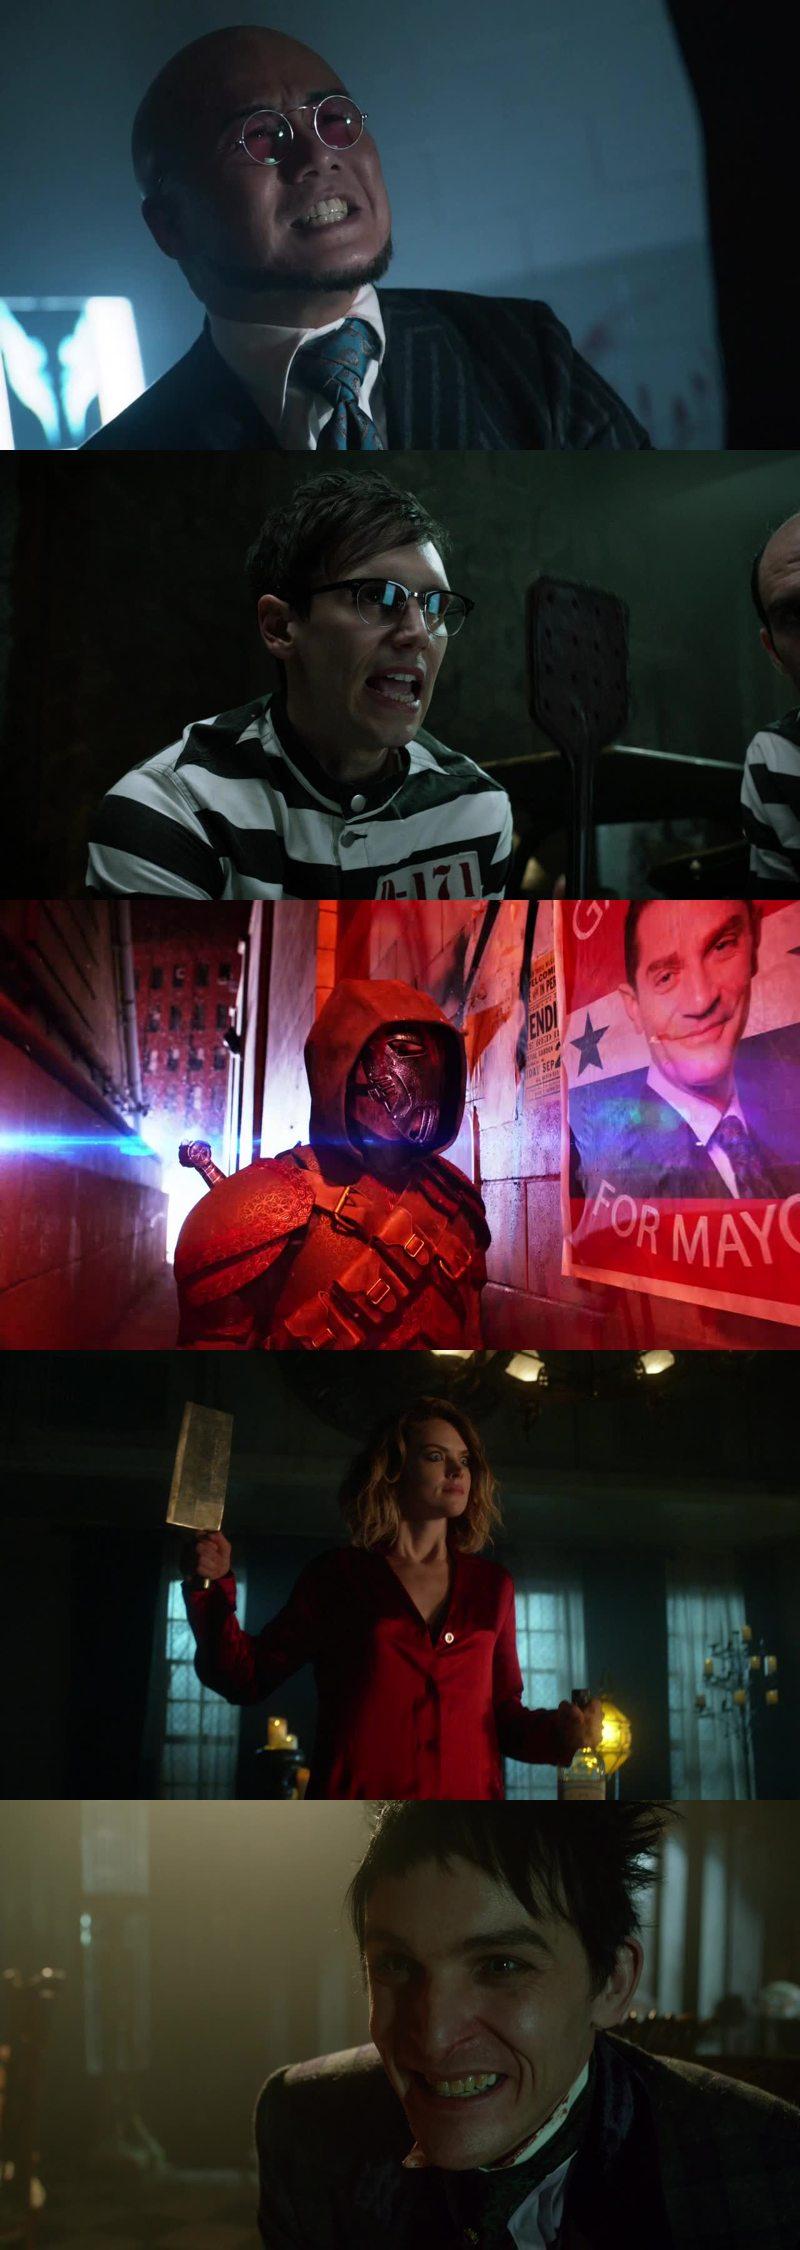 Gotham villains are the best